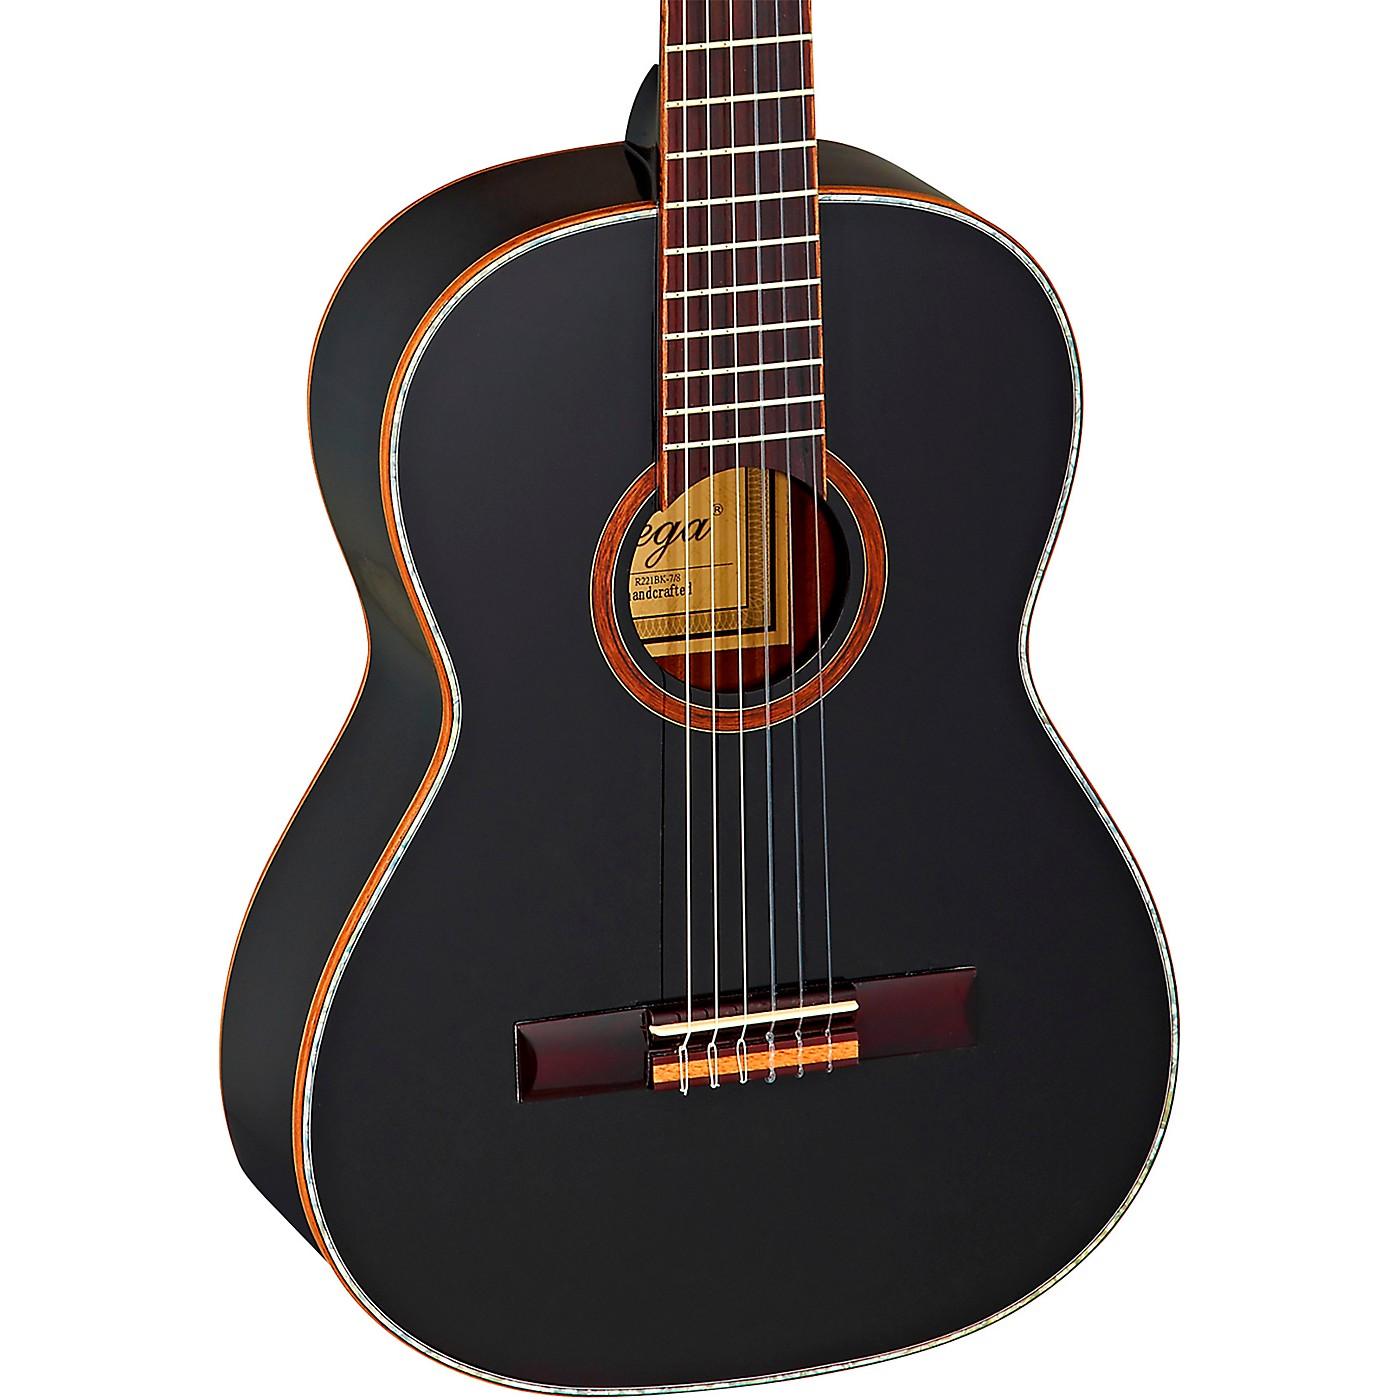 Ortega Family Series R221BK-7/8 7/8 Size Classical Guitar thumbnail